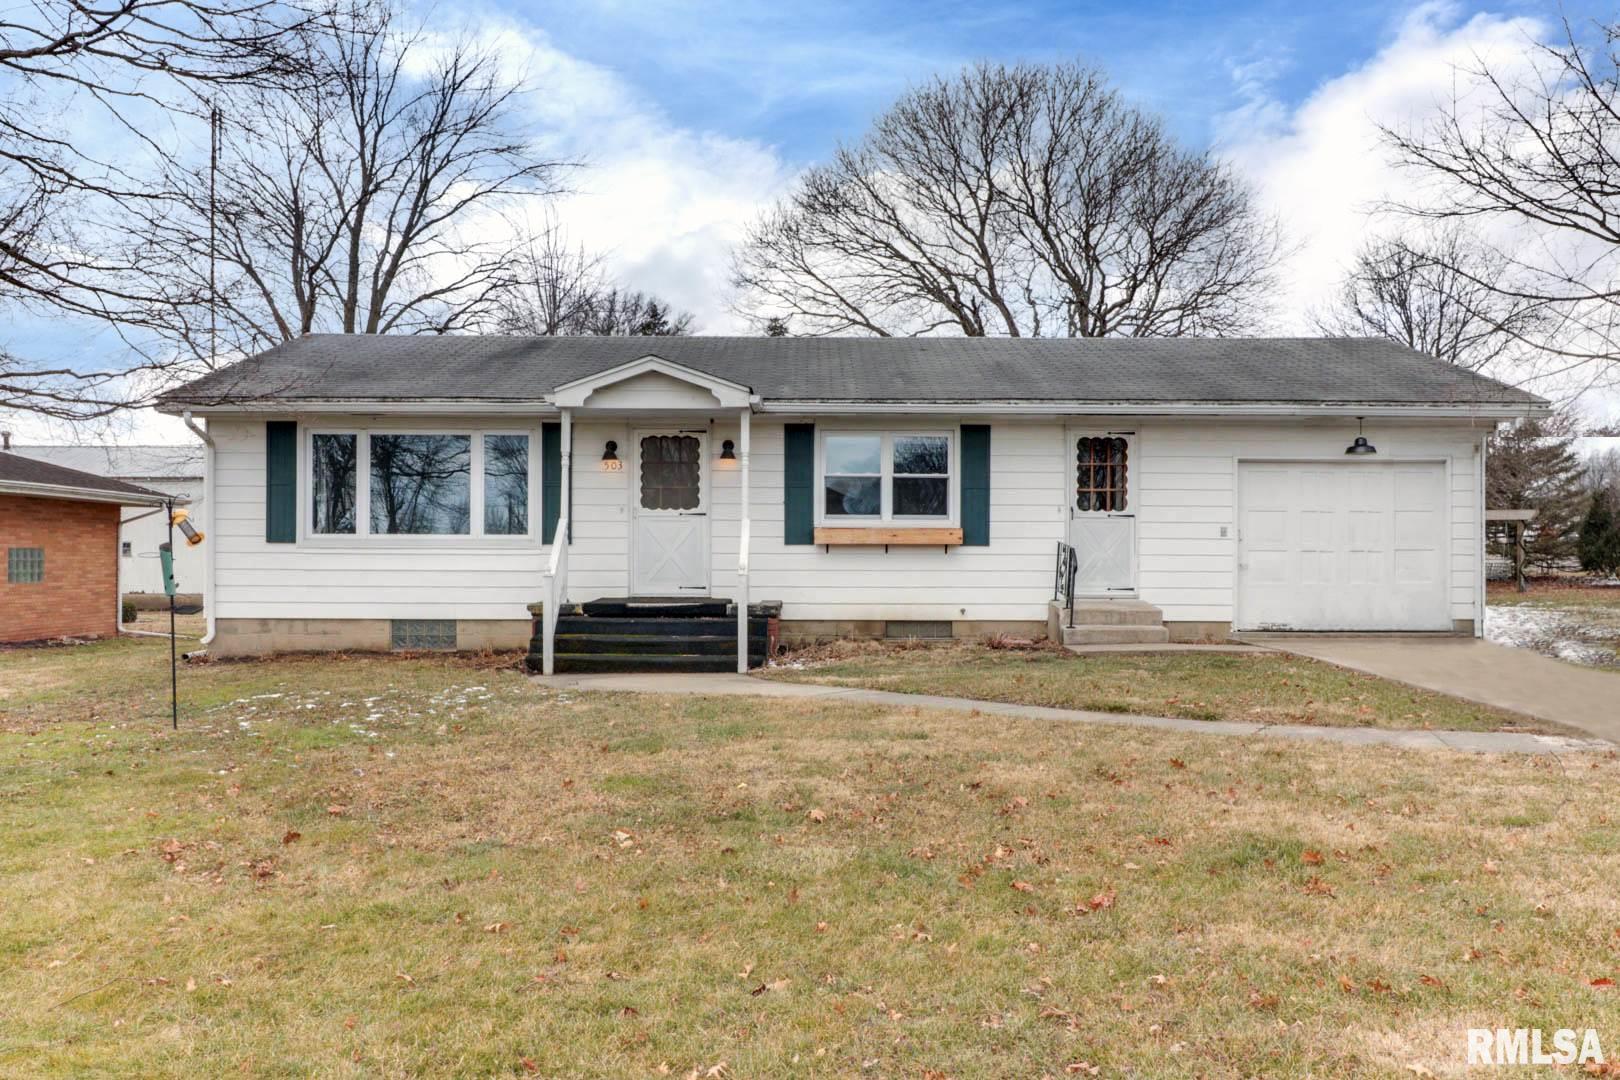 503 HILLCREST Property Photo - Emden, IL real estate listing